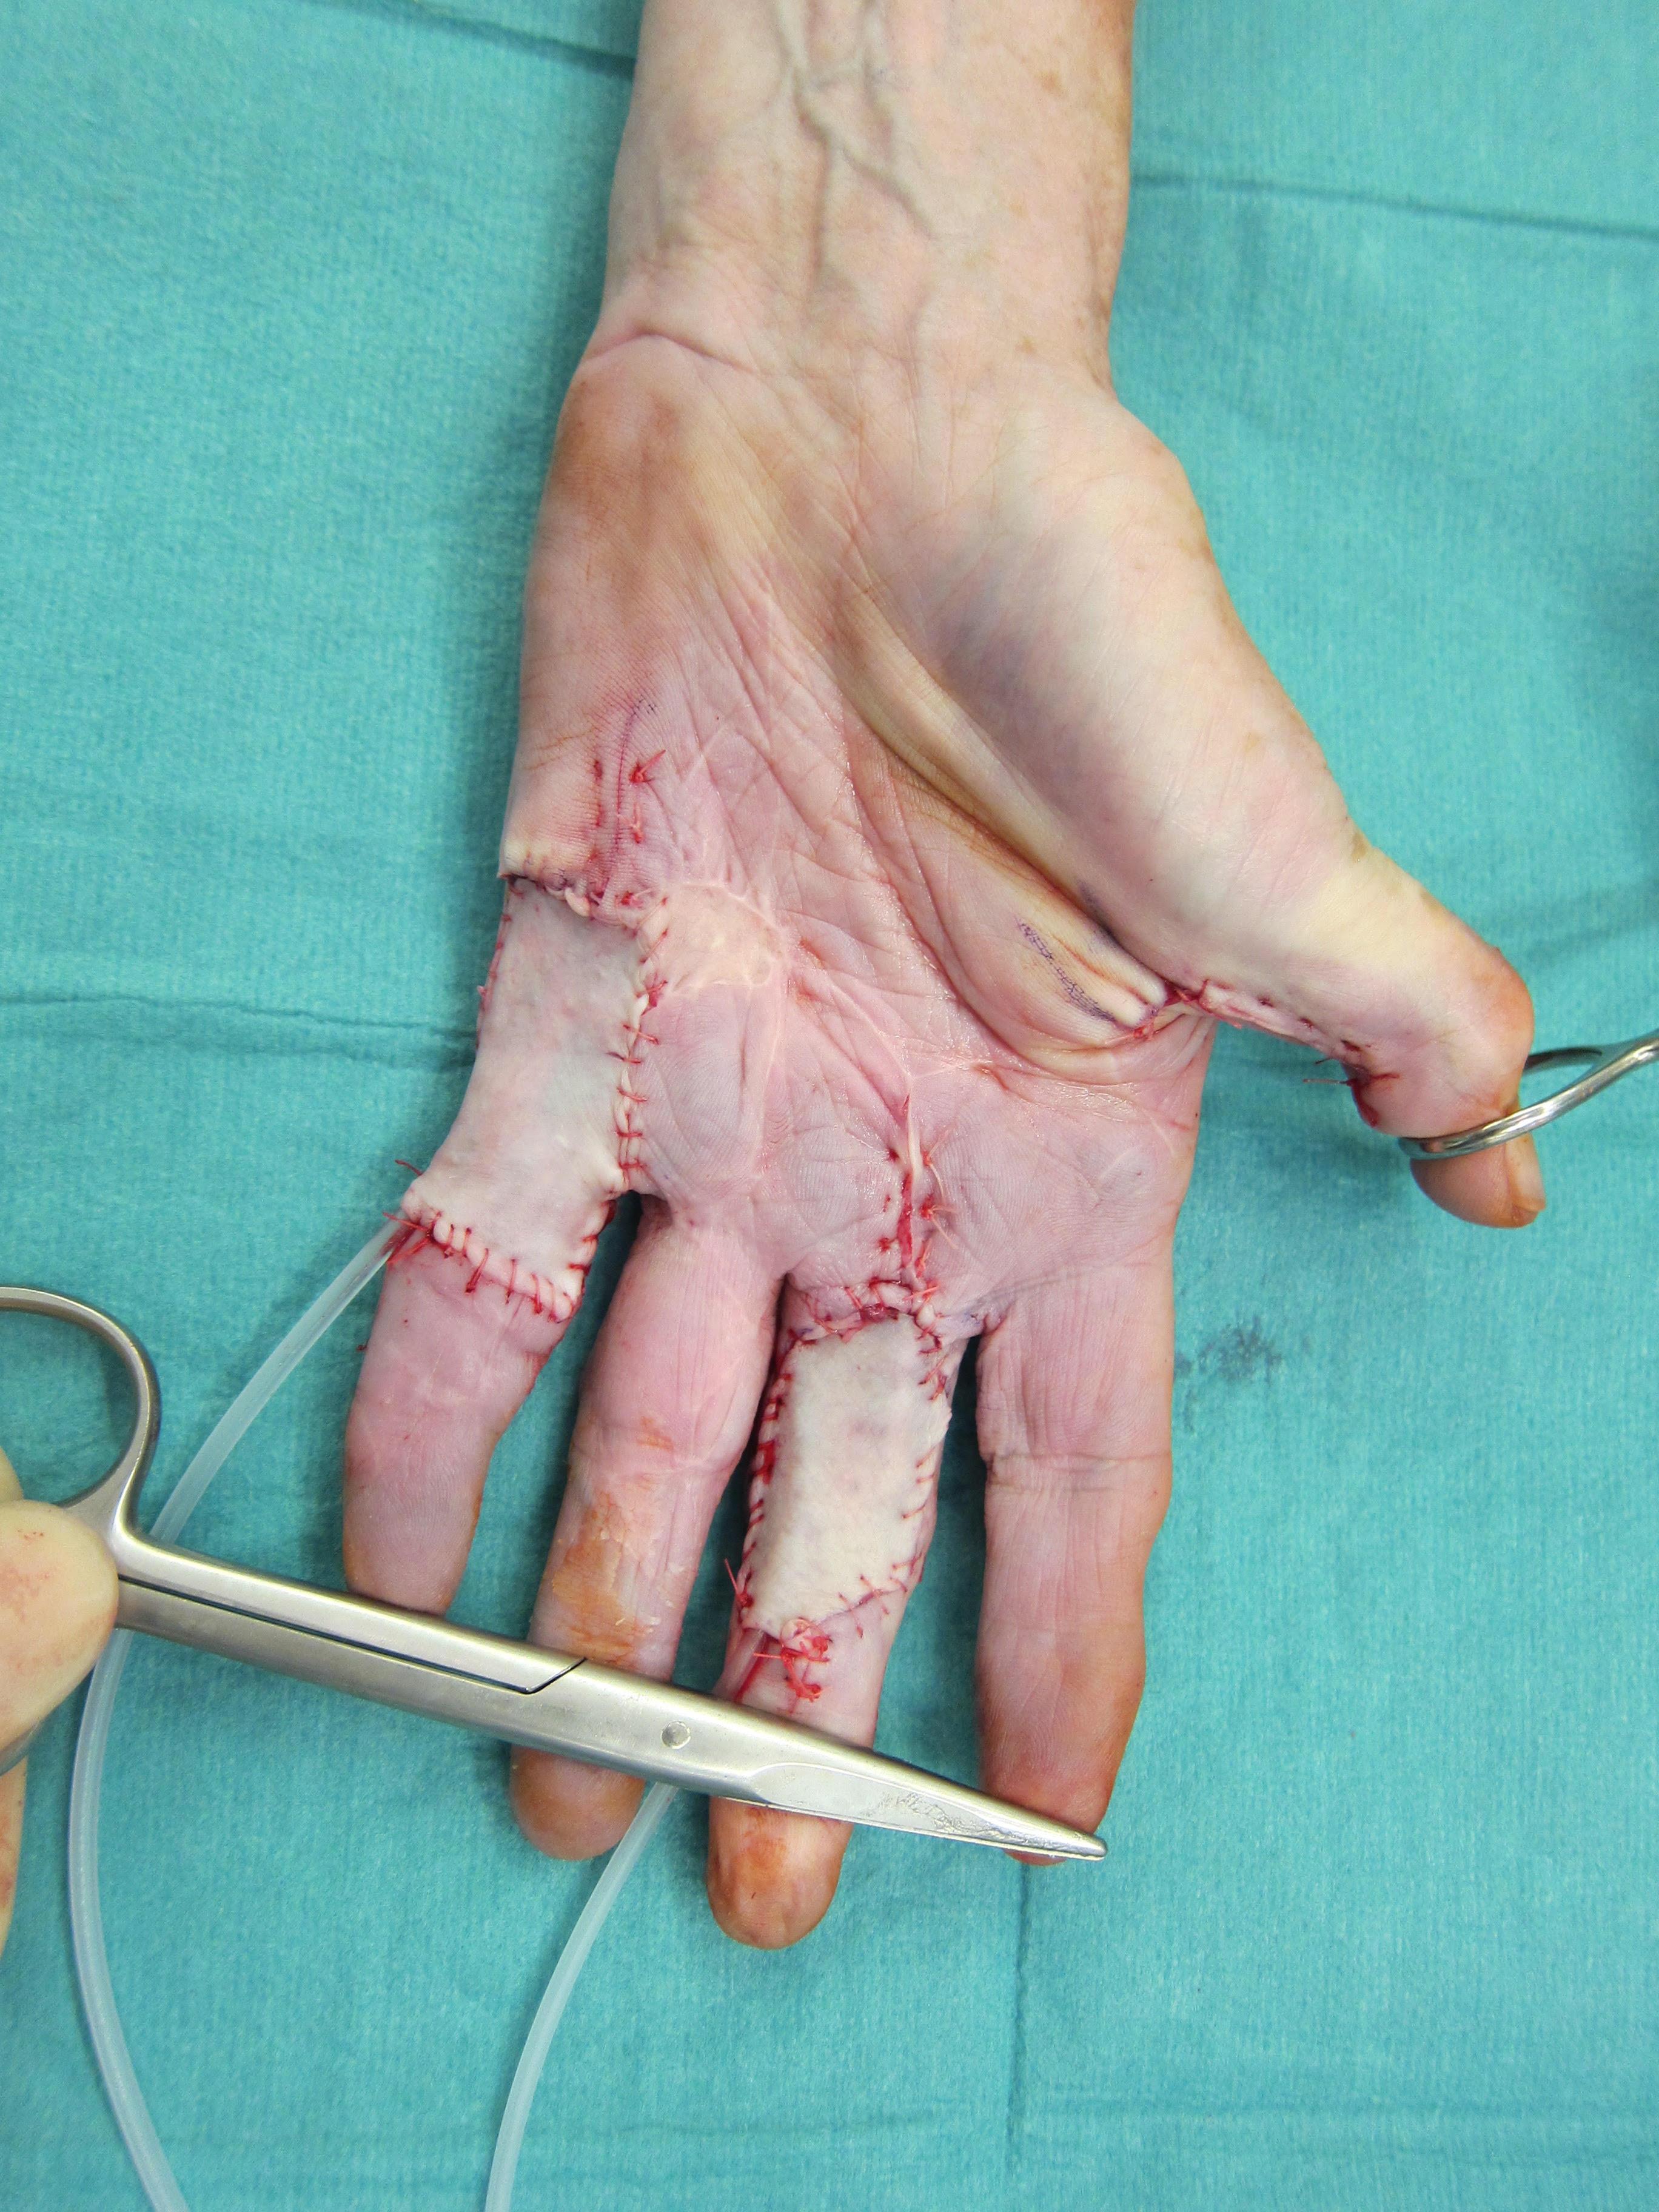 Dupuytren's Contracture | Essex Plastic Surgery | Adam Sierakowski